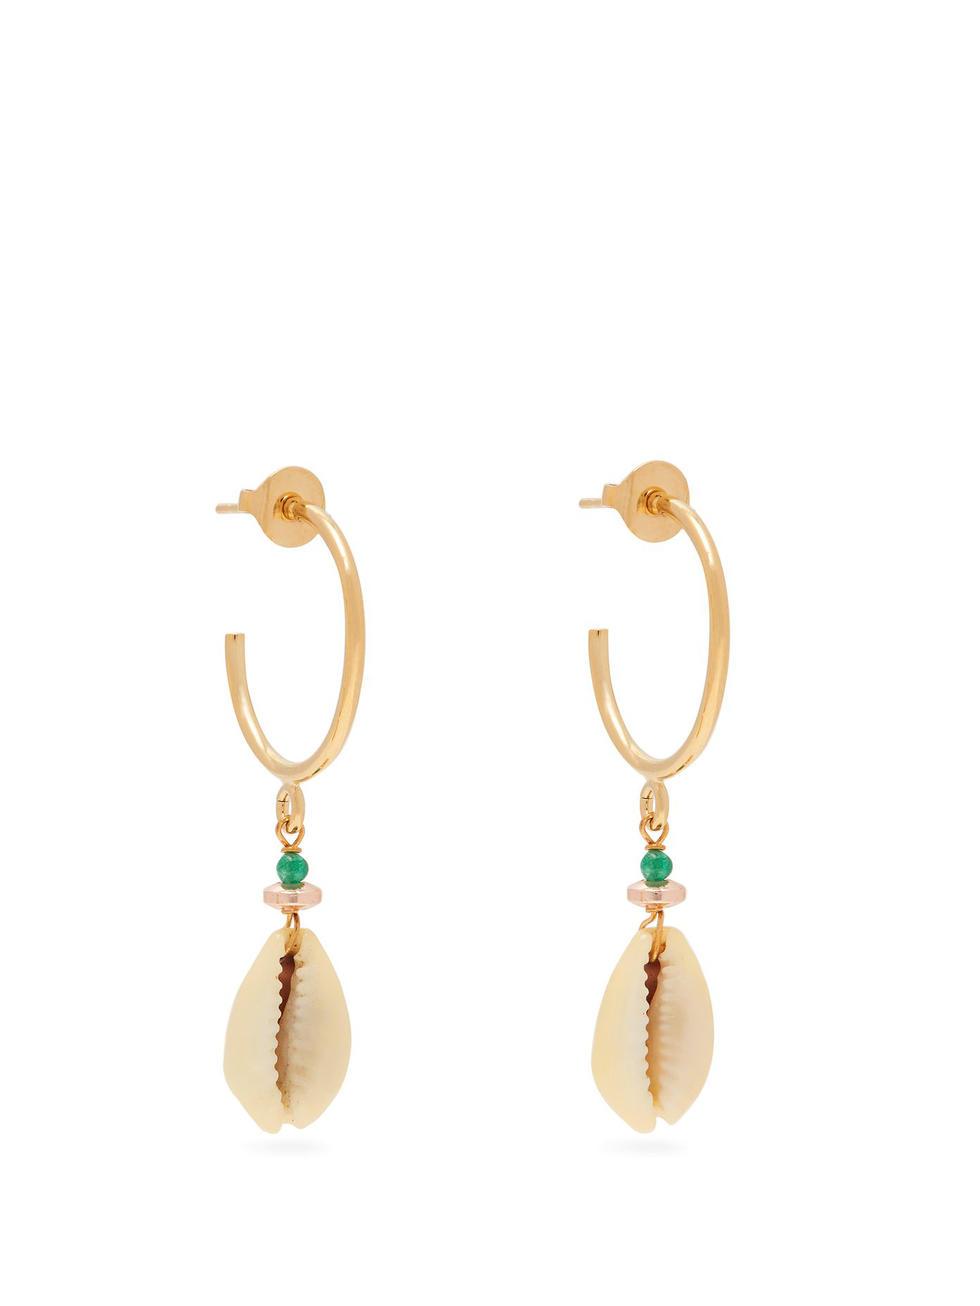 Malebo shell earrings, Dhs312, Isabel Marant